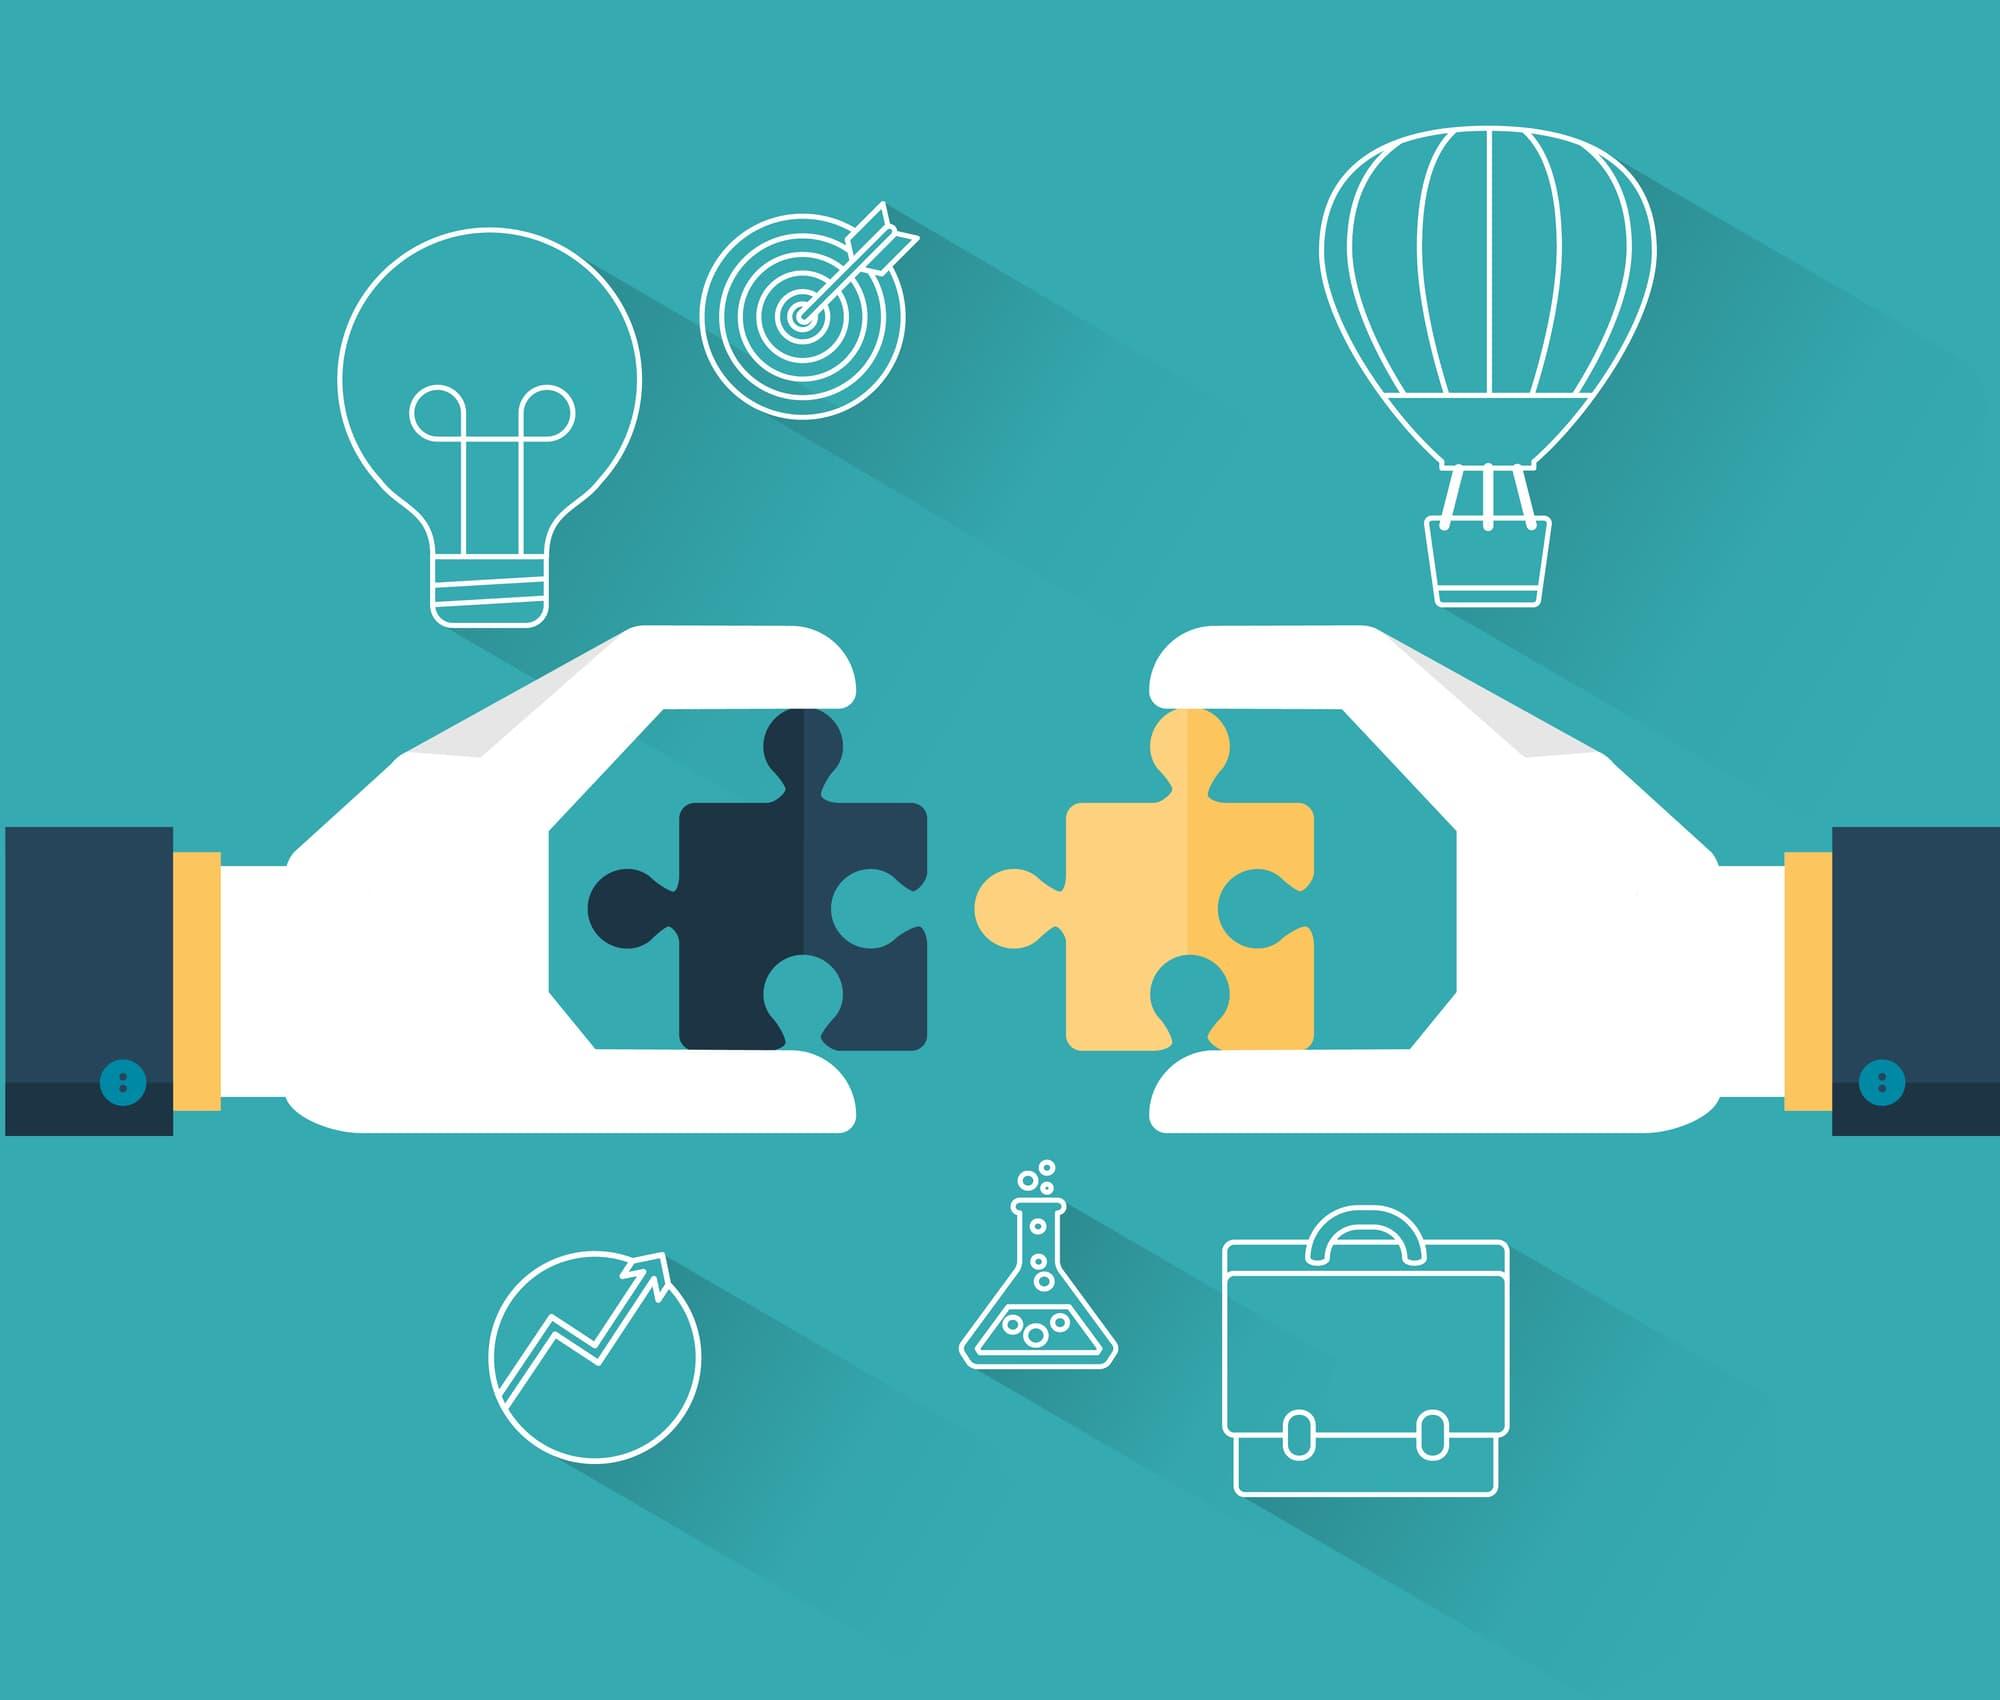 Integration testing of software to make sure components work together.